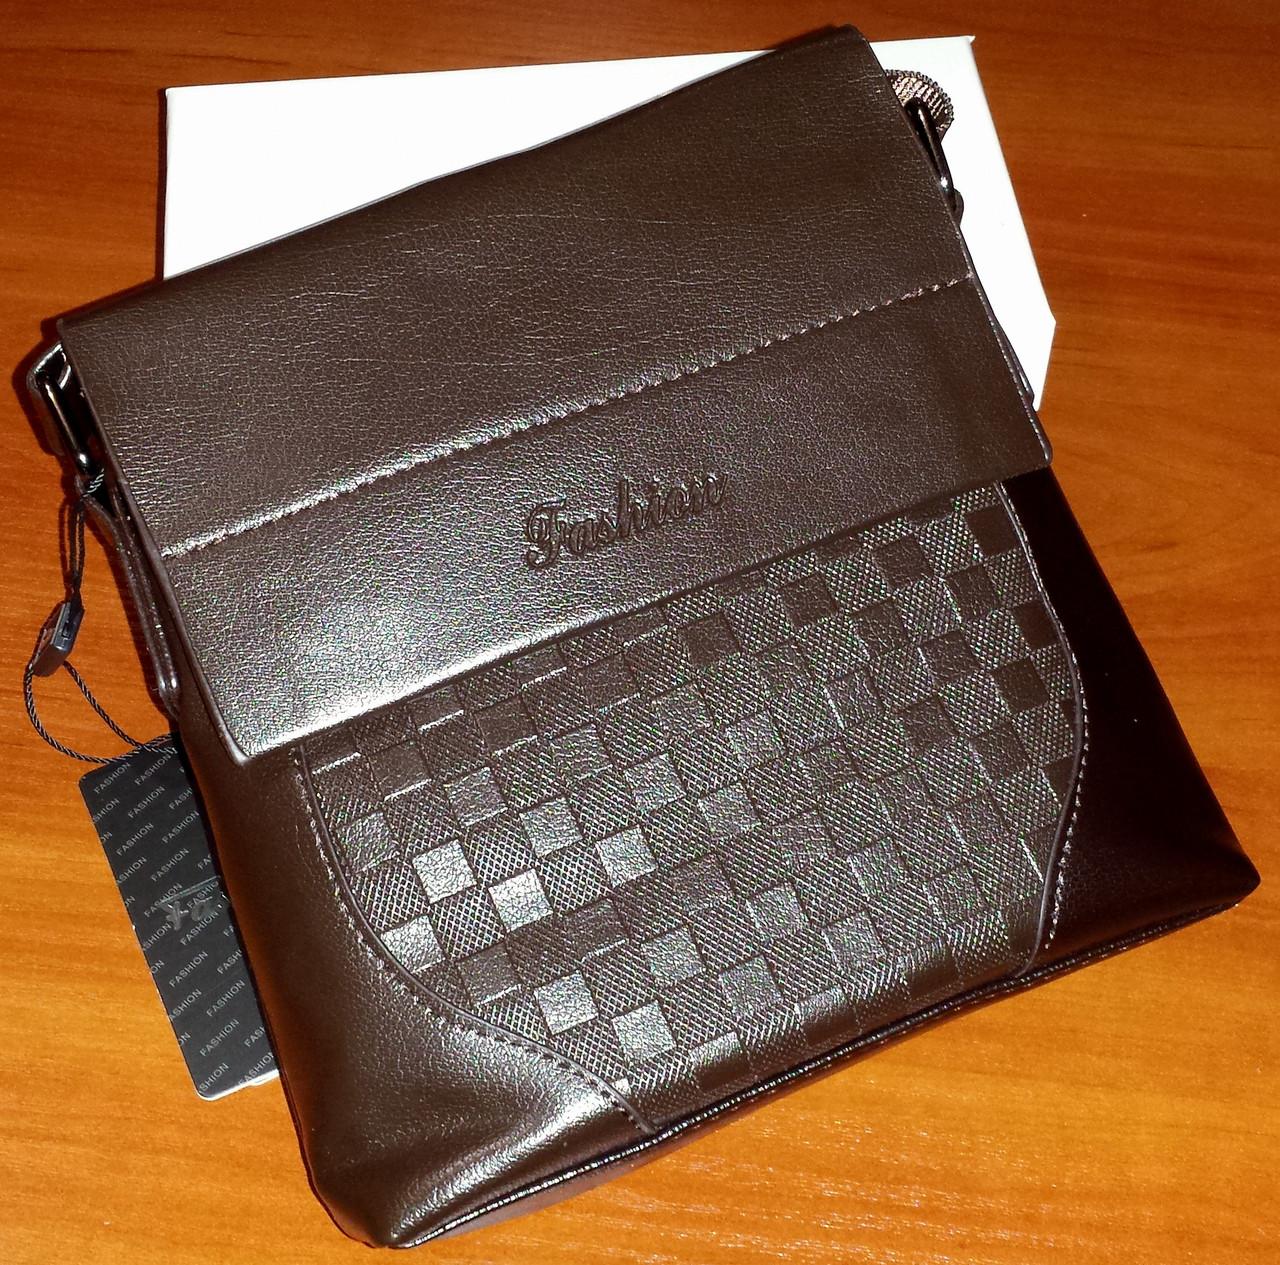 4e6e93ab8839 Мужская фирменная сумка Fashion 106-1 Brown (20,5x17x6см). 230 грн. Купить